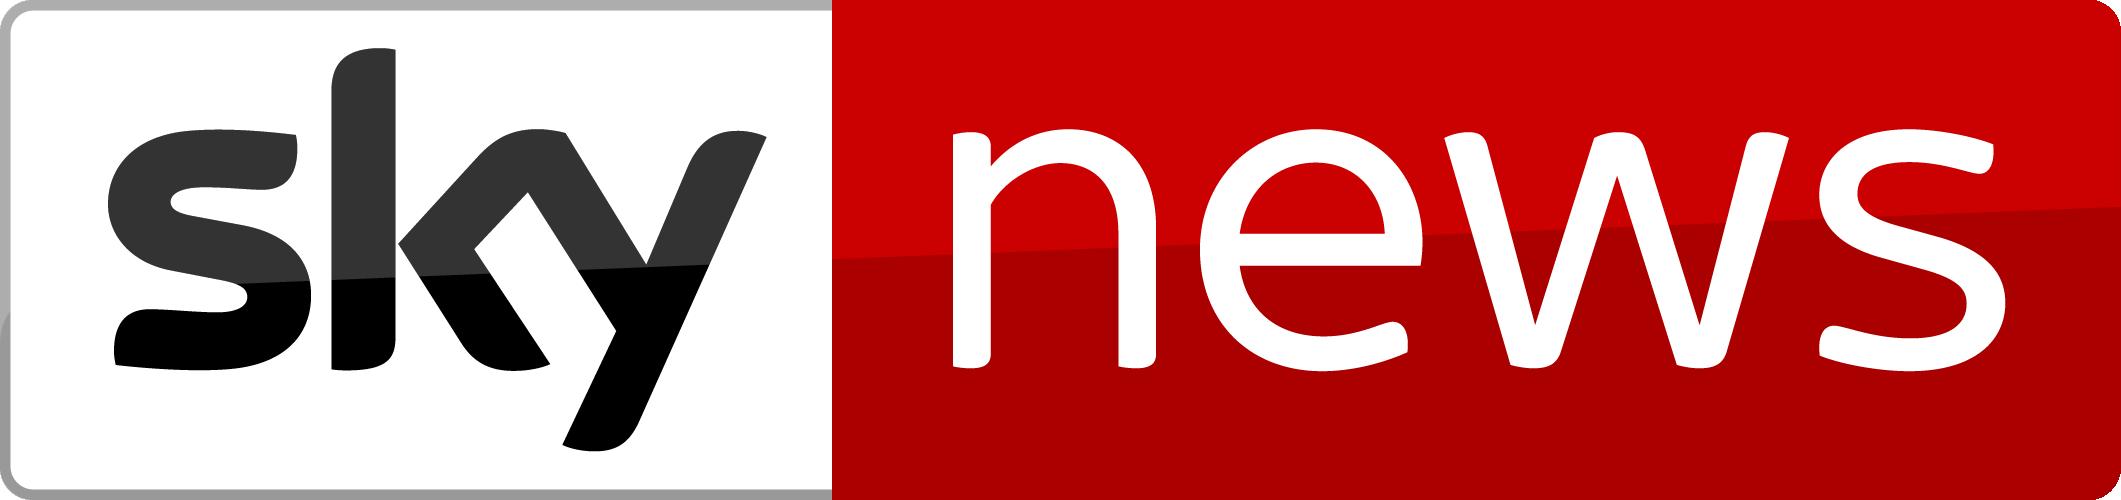 SkyNews width=